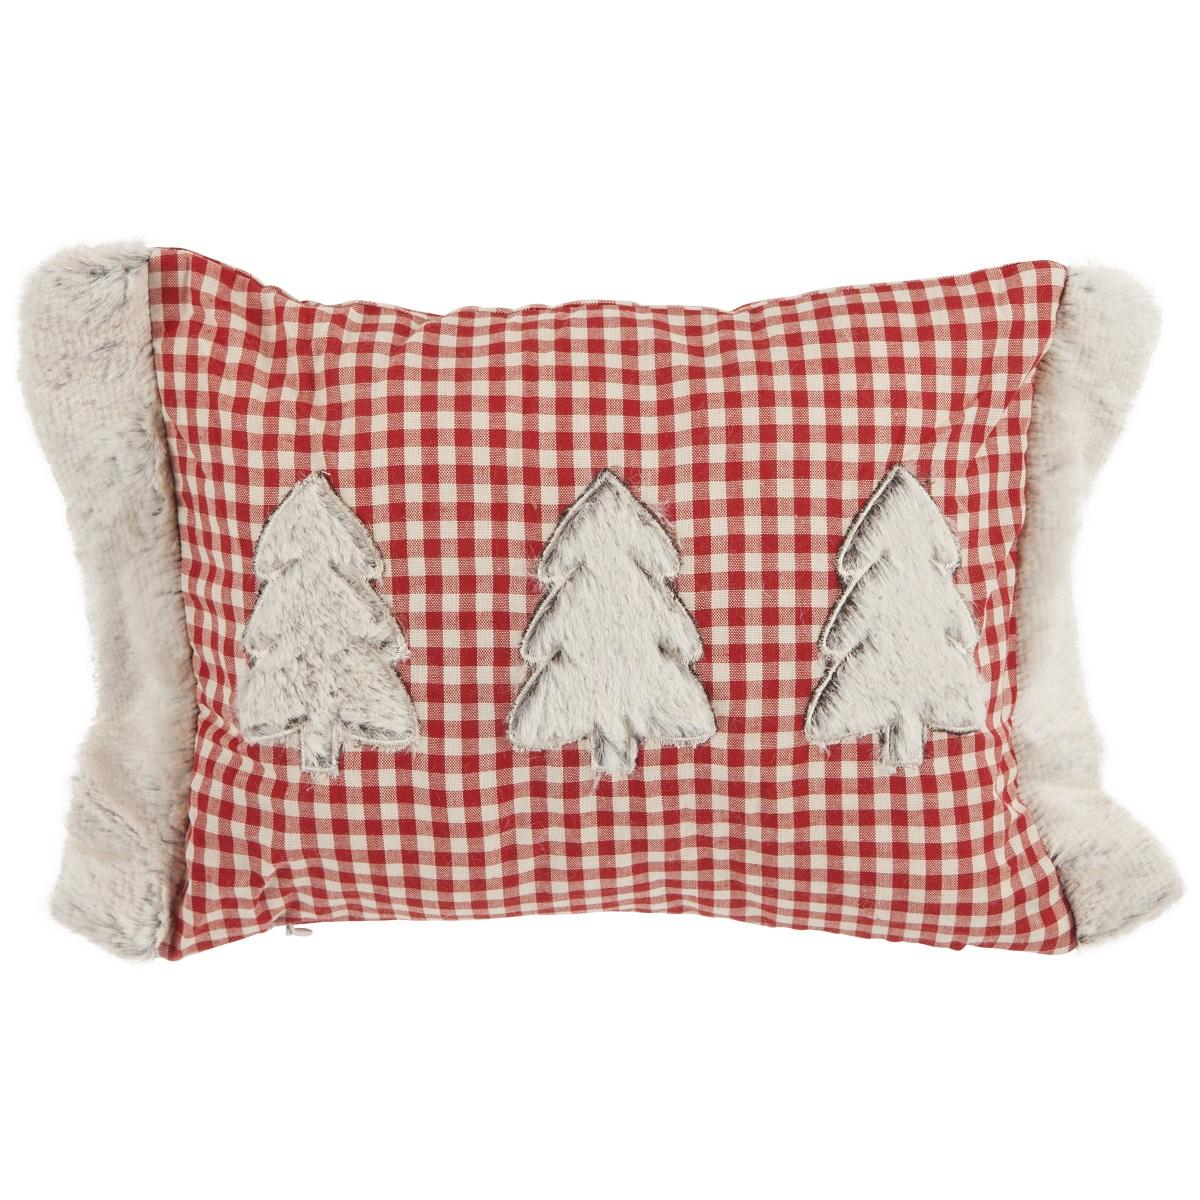 Wohnideen Weihnachtsdeko indoor kissen finn rot 24cmx32cm kopfkissen sofakissen weihnachtsdeko